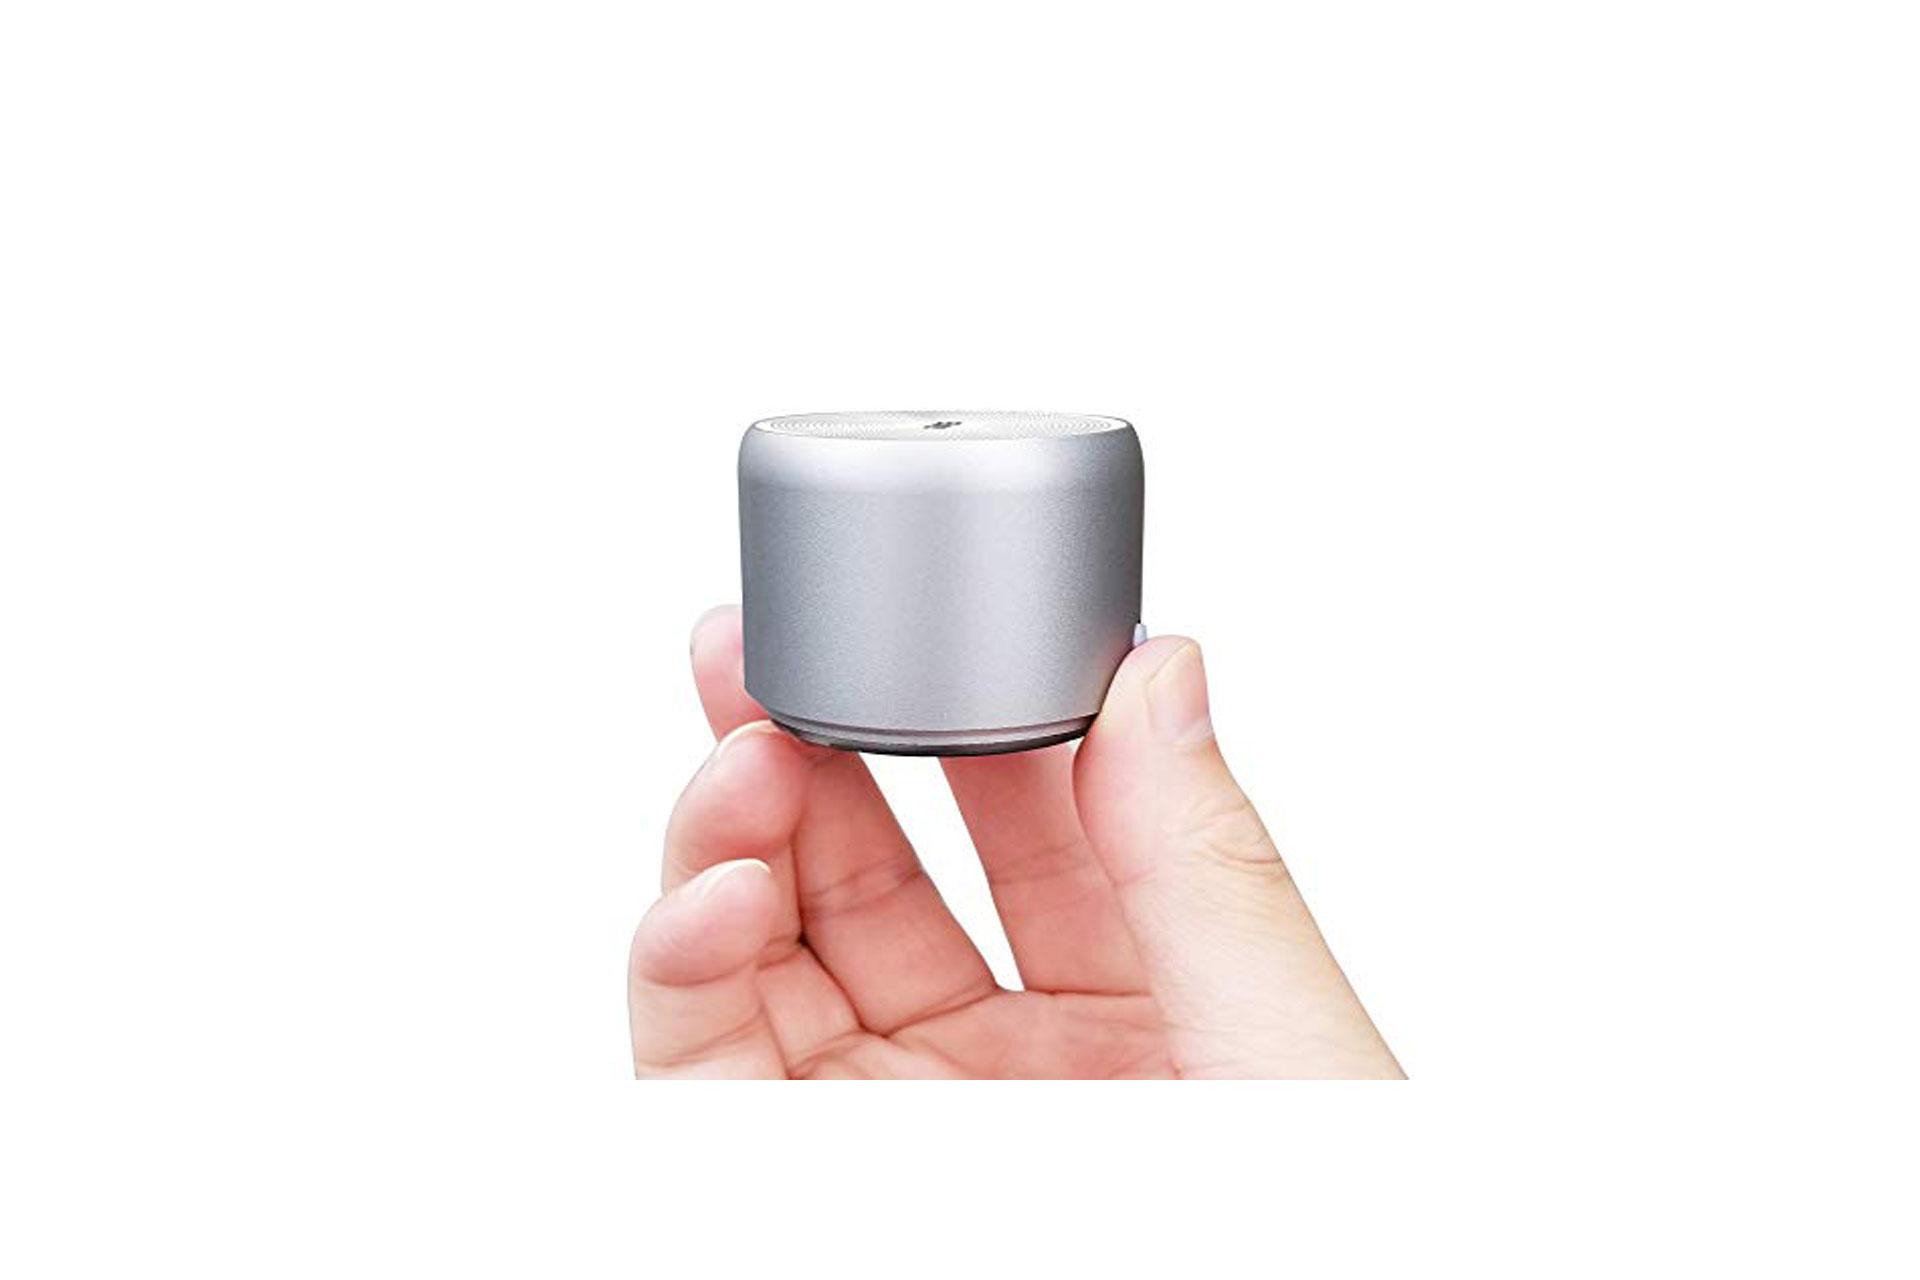 EWA bluetooth speaker; Courtesy of Amazon